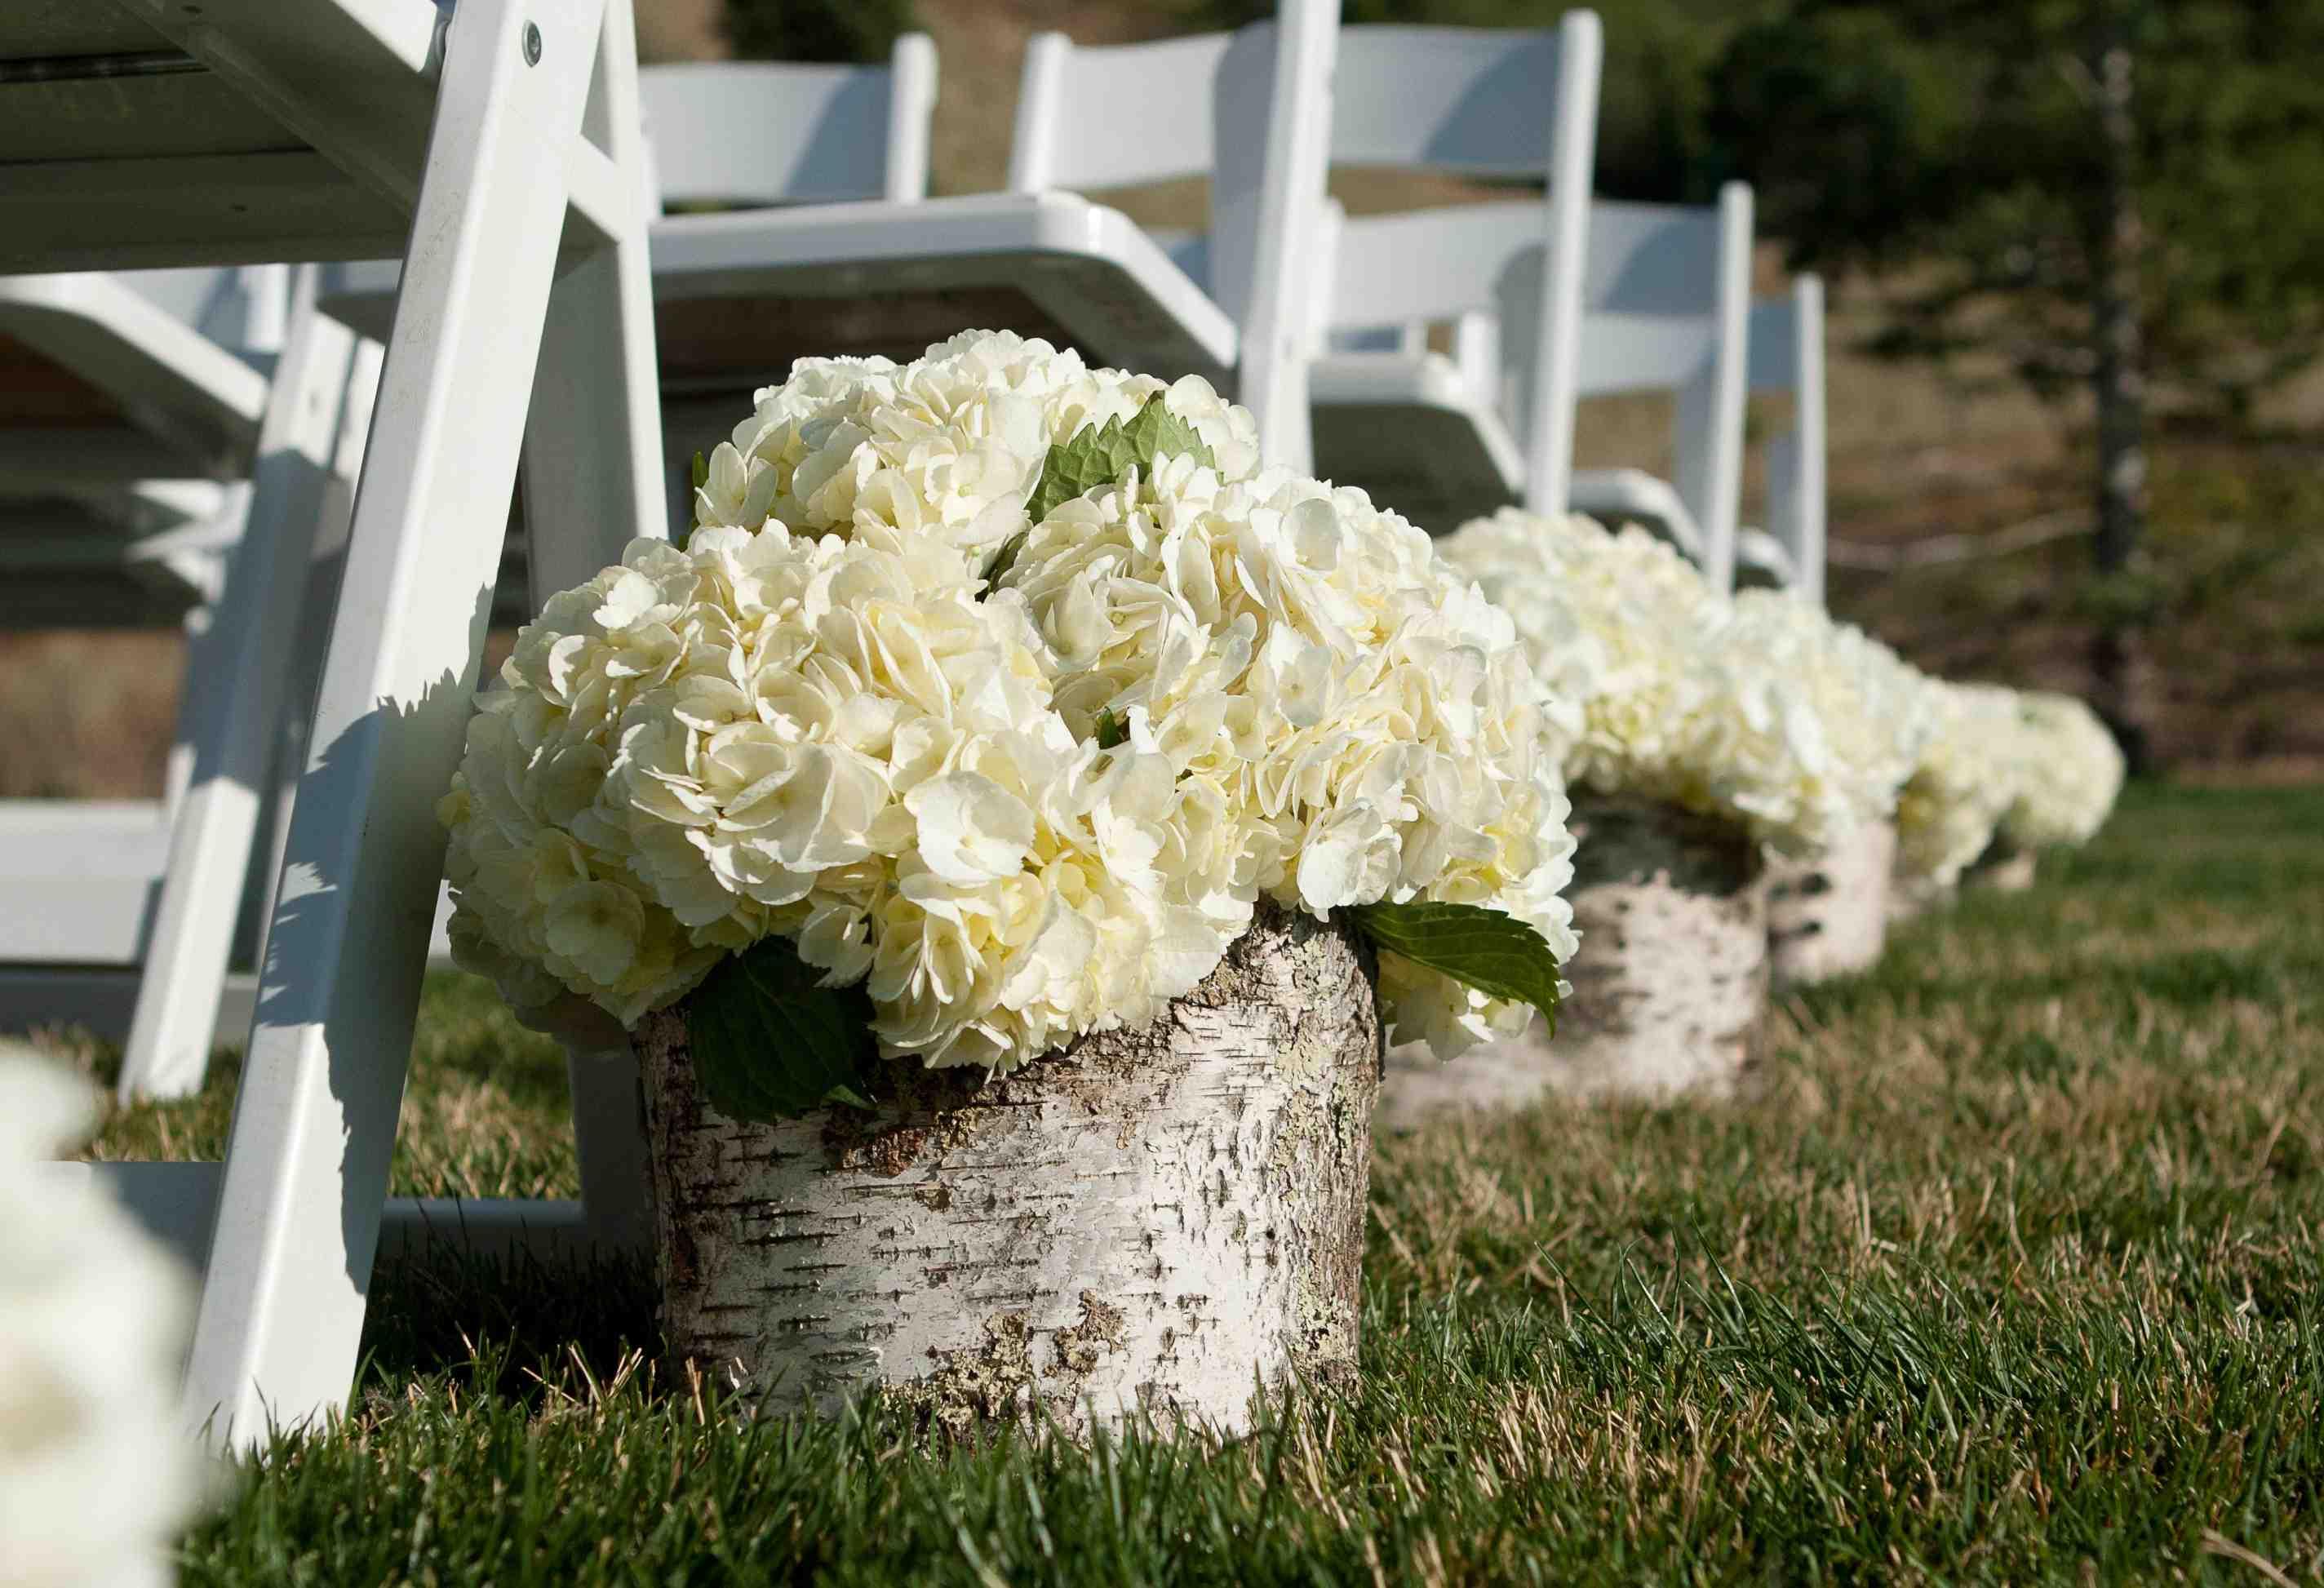 Hydrangea Flower Arrangements For Your Wedding Inside Weddings